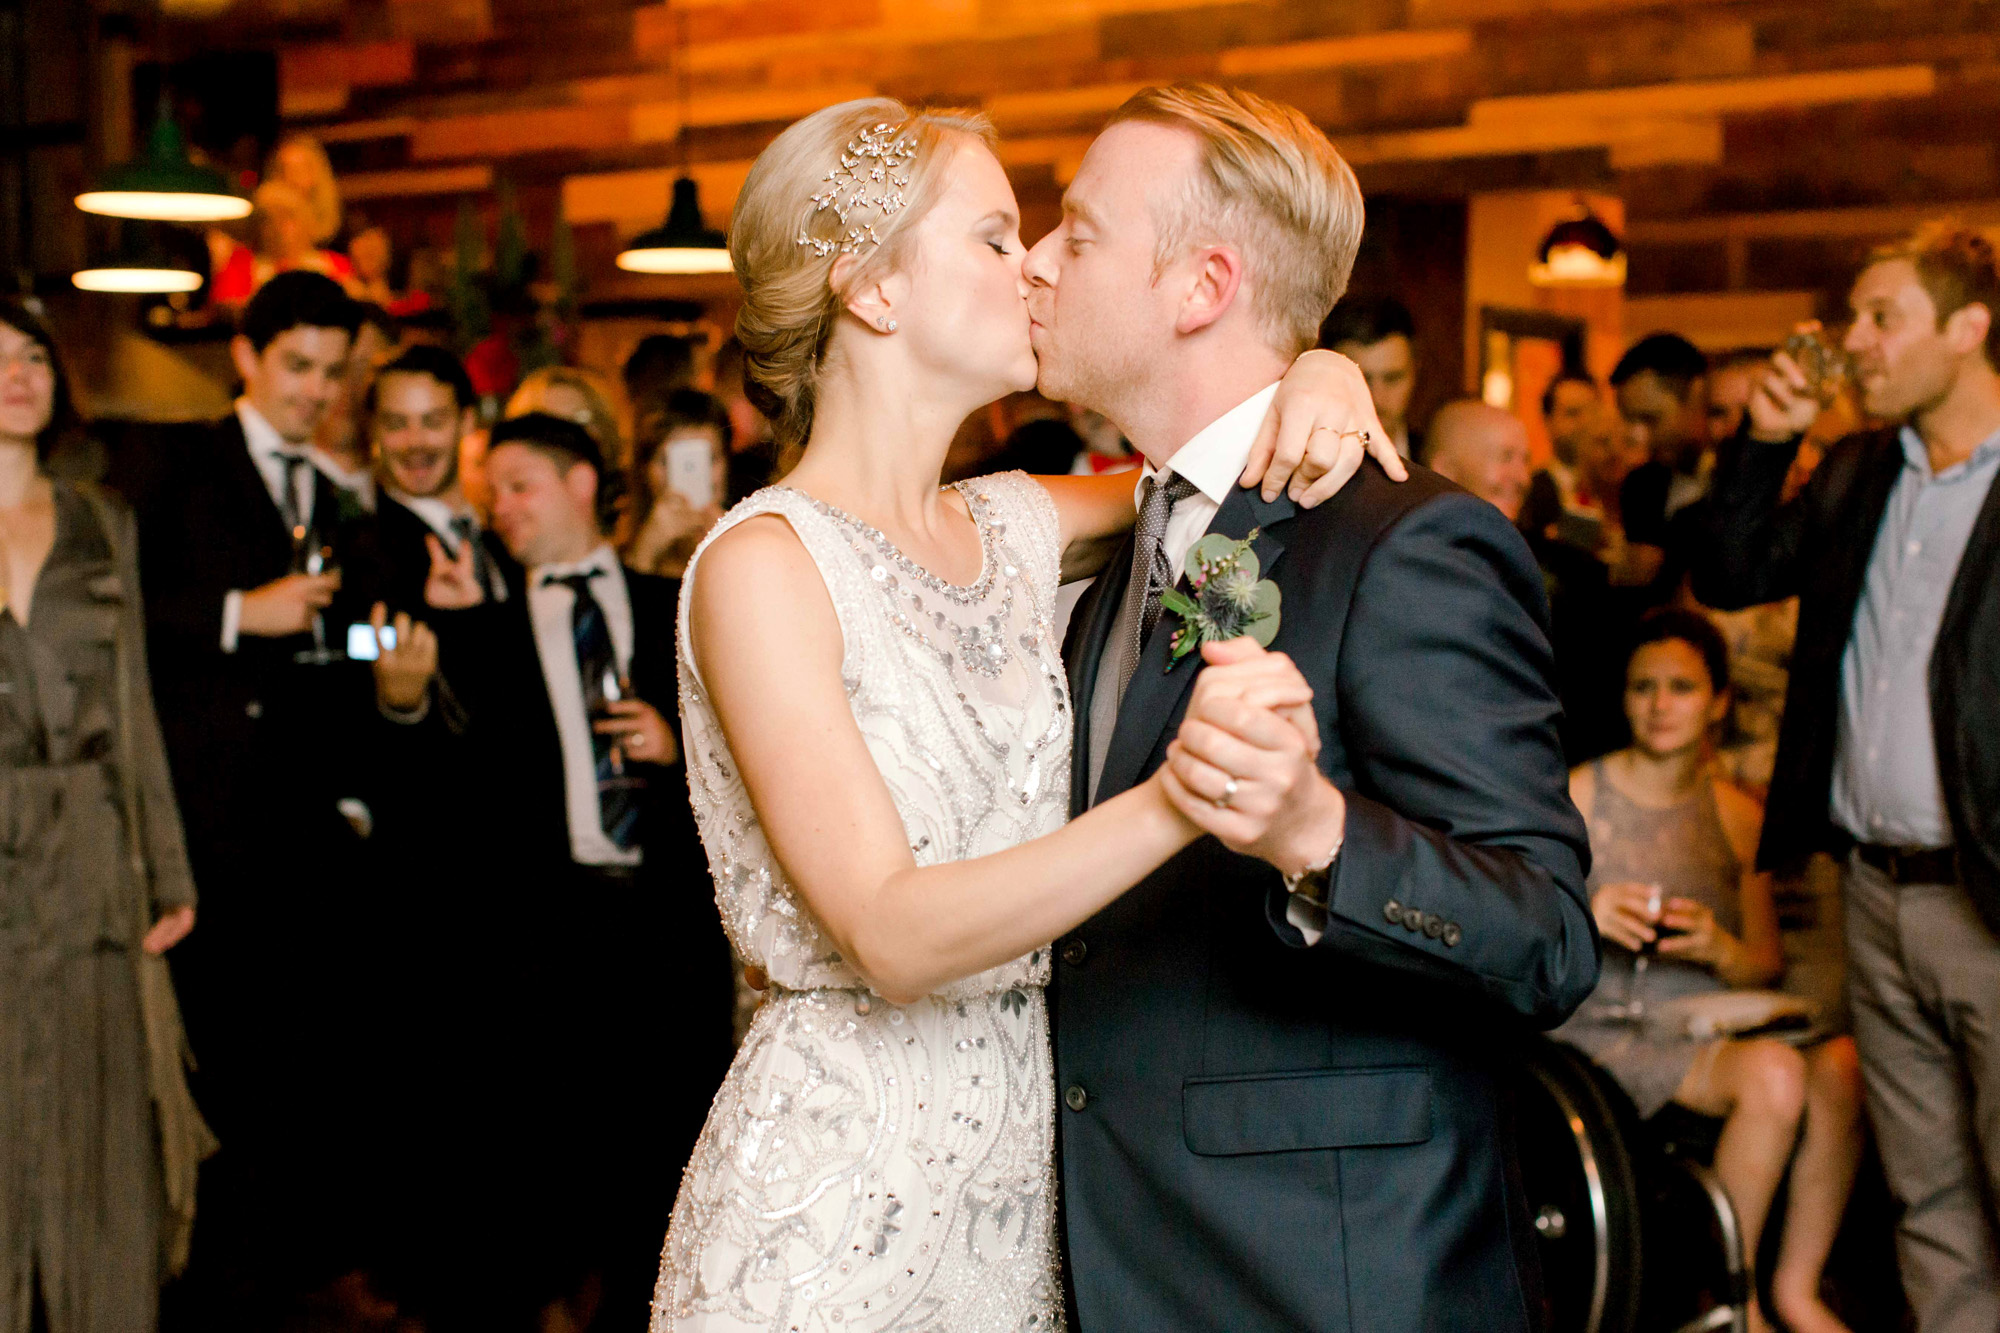 49_Kasey_Paul_Brooklyn_Winery_Wedding_187.jpg